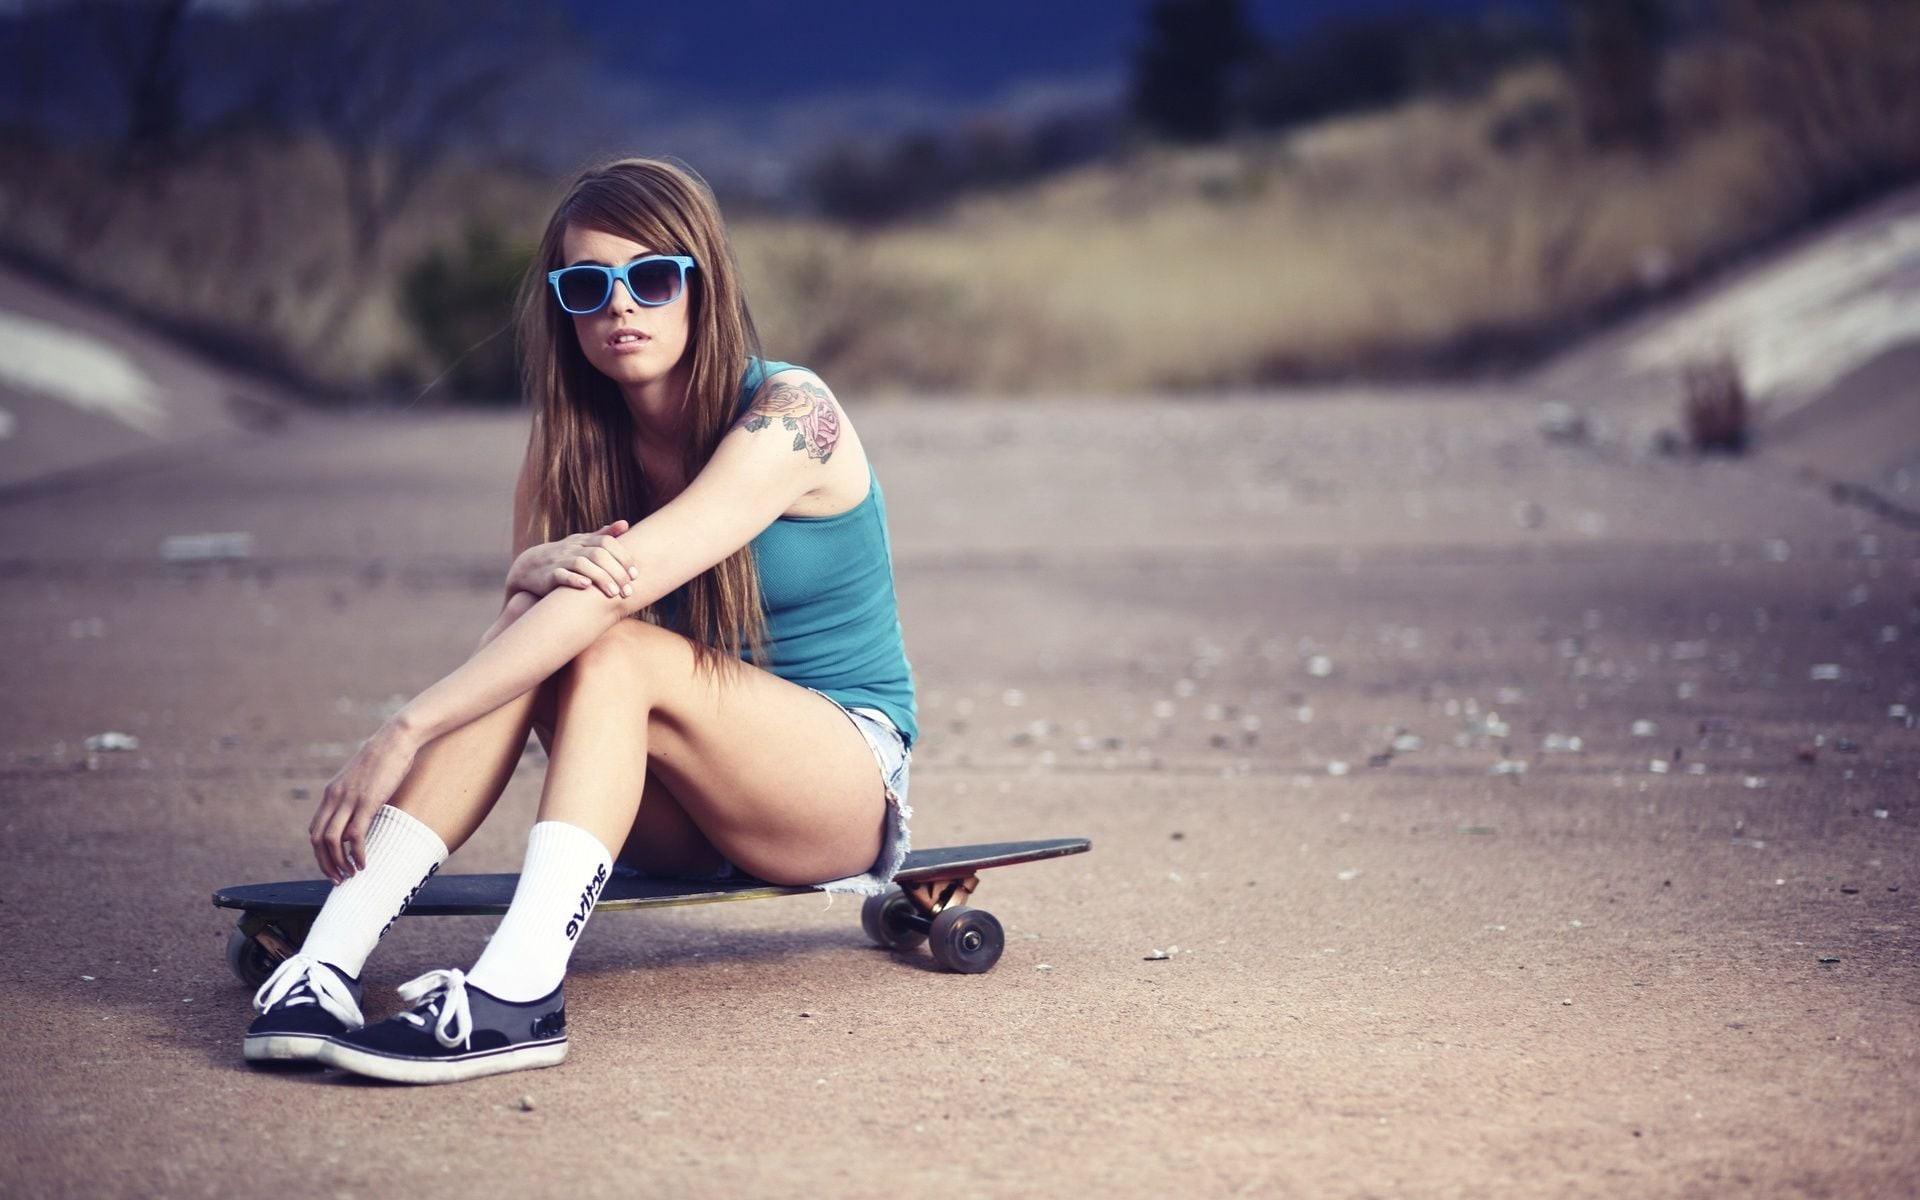 1920x1080 Skateboarding Background wallpaper wallpaper free download 1920×1080 Skateboarding Wallpaper (45 Wallpapers) |